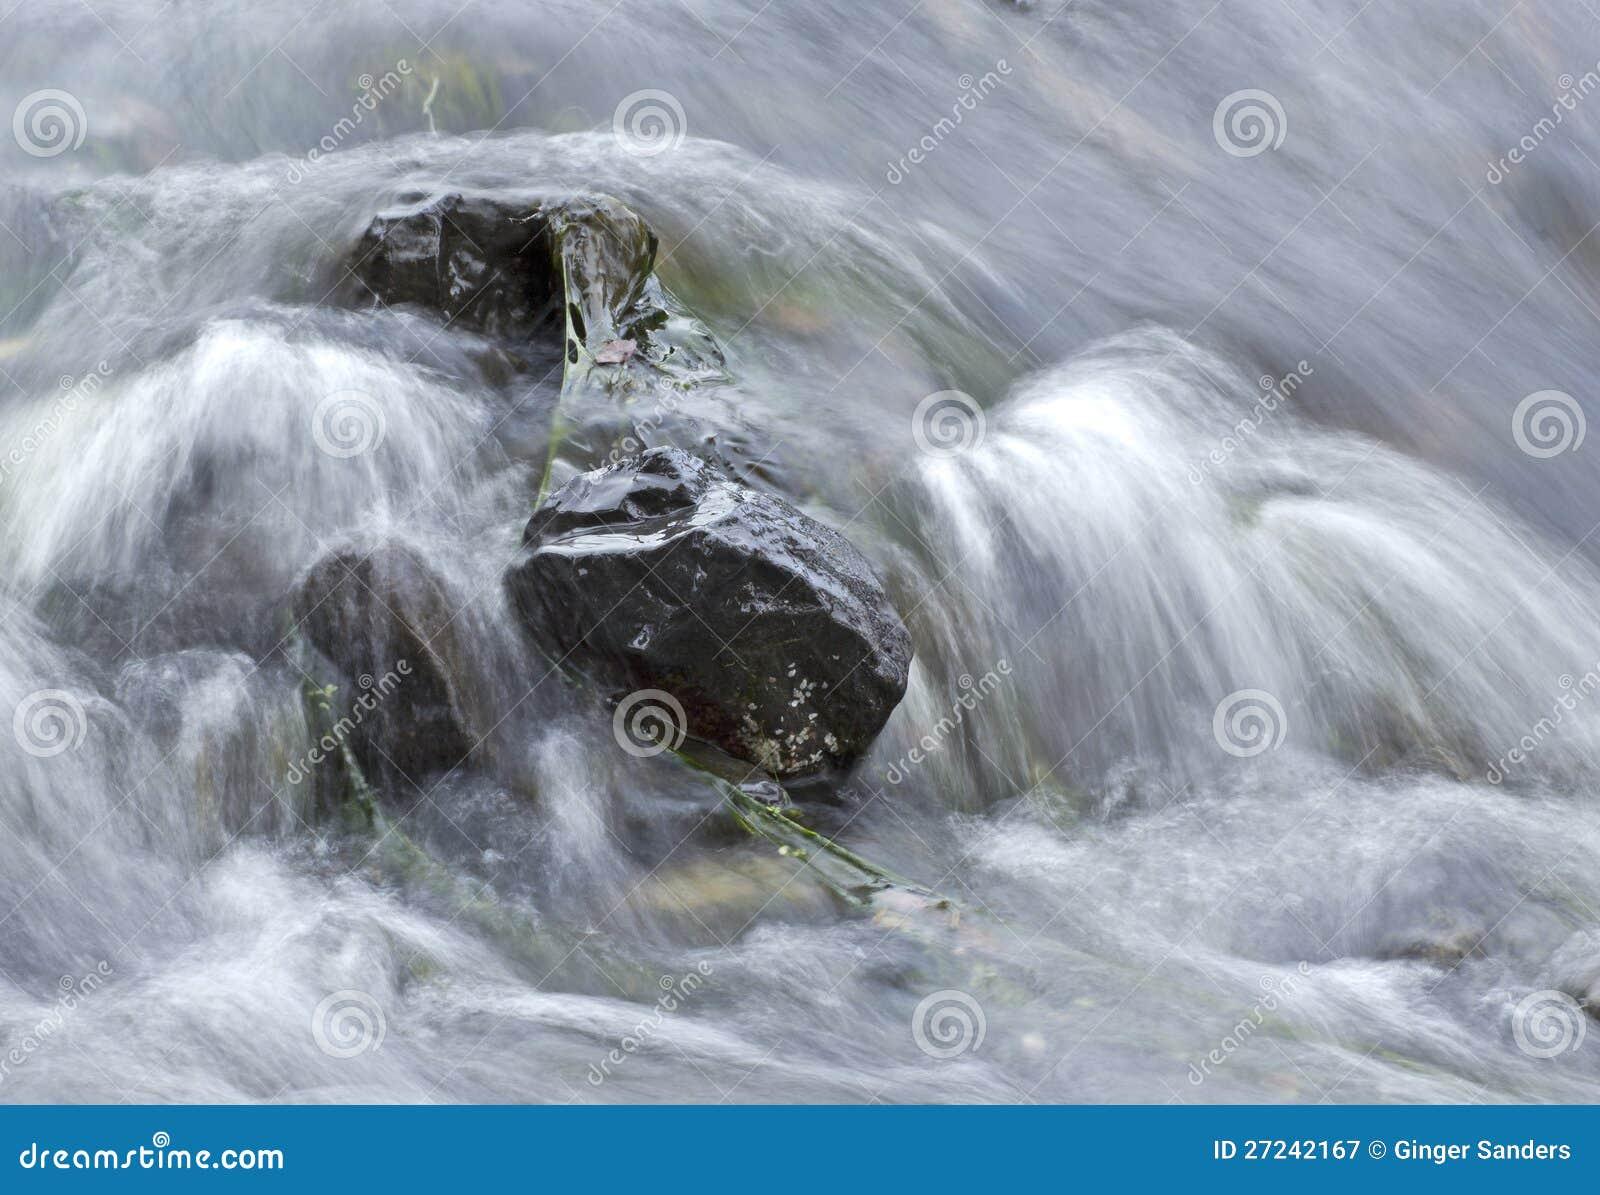 Soft Water Rushing Over Rocks